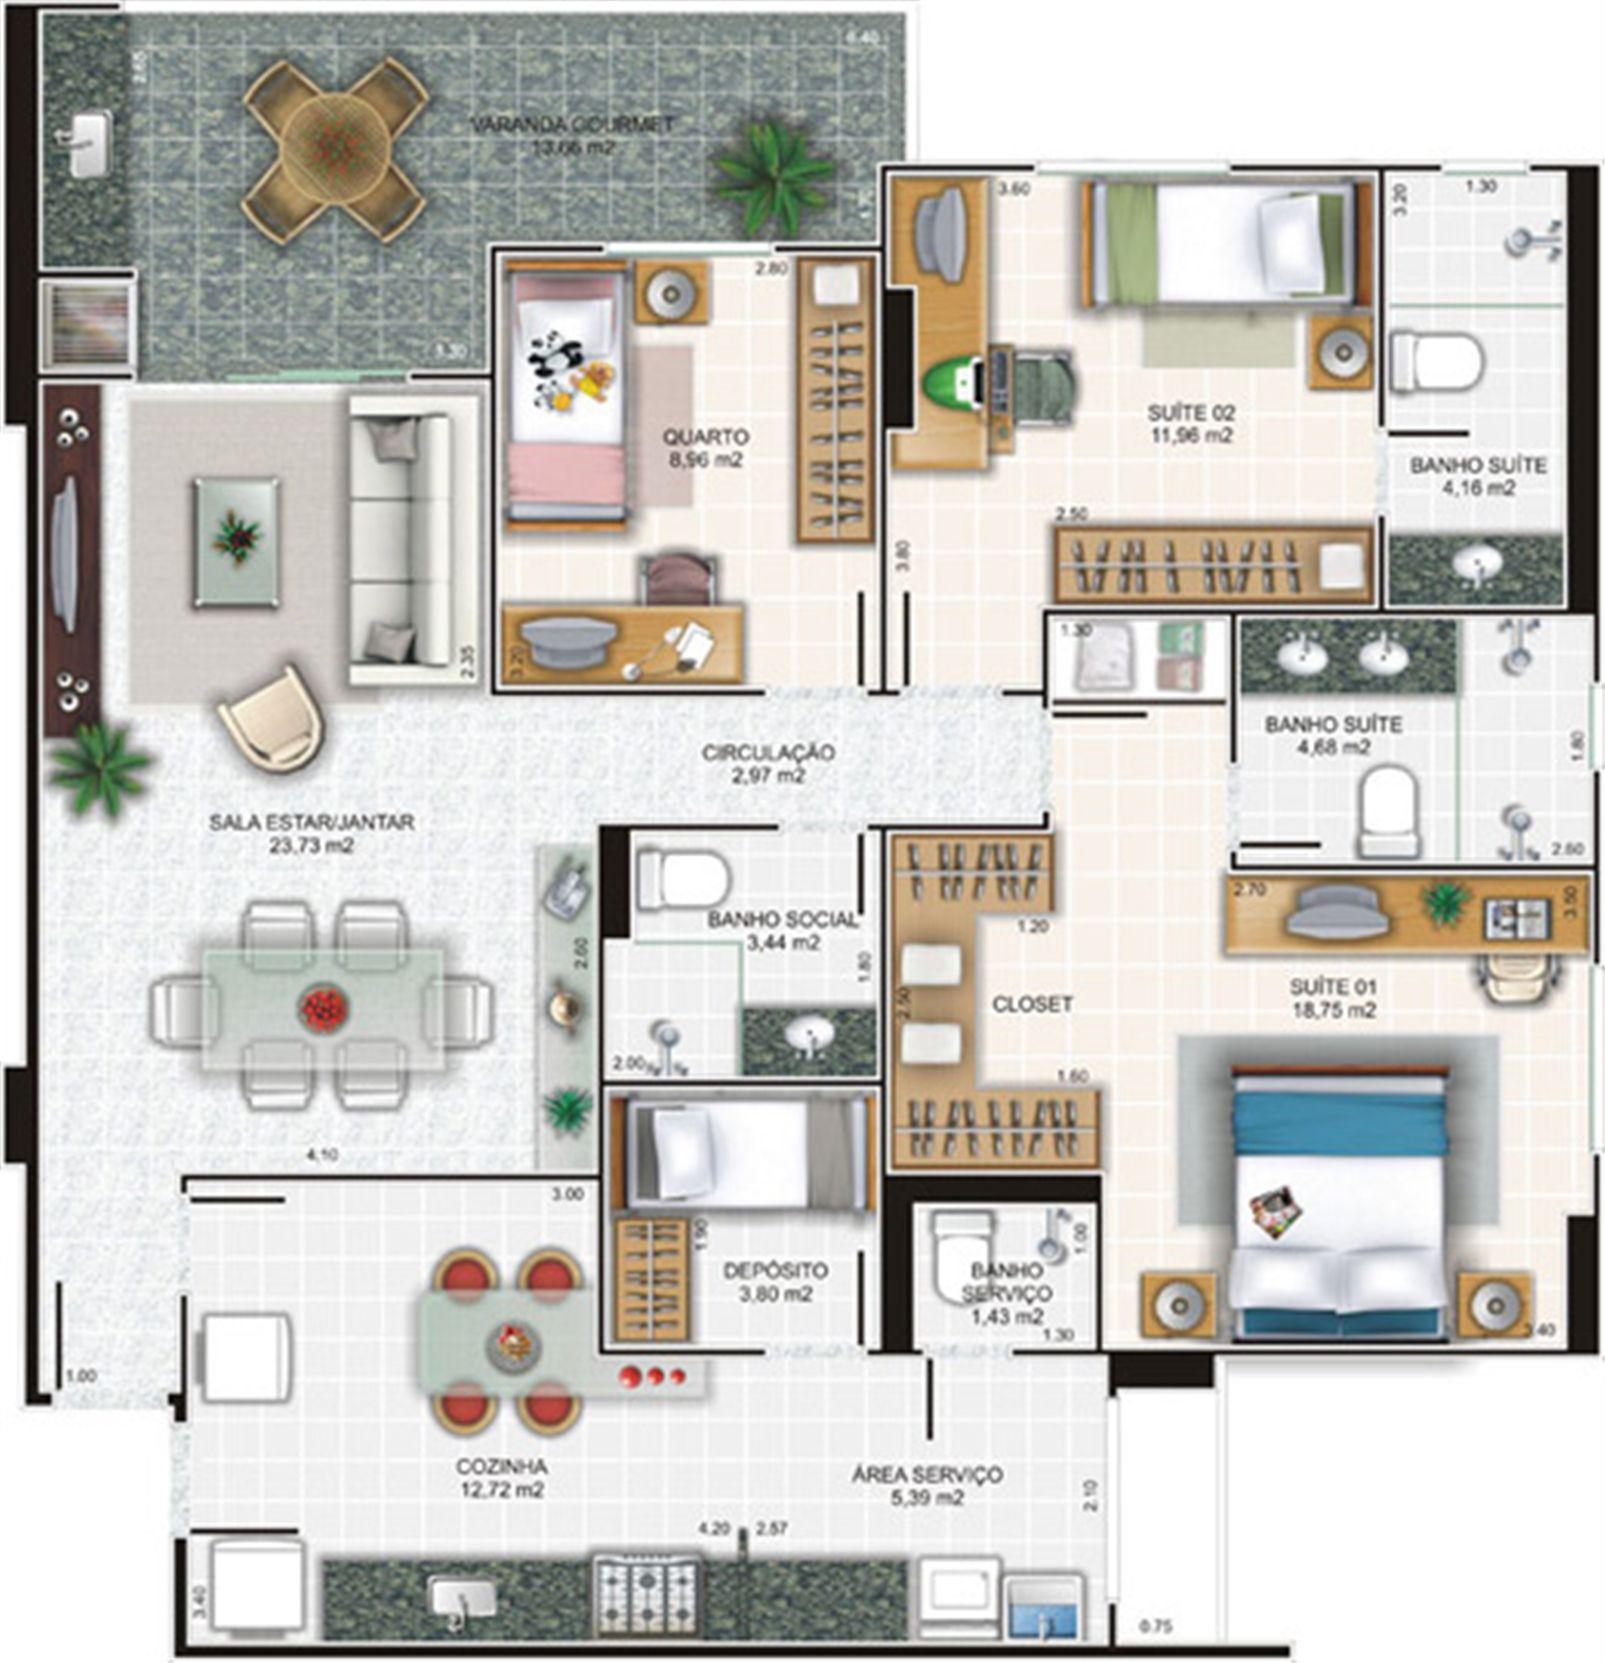 Planta apartamento 4 | Edifício Caiobás – Apartamentoem  Laranjeiras - Serra - Espírito Santo